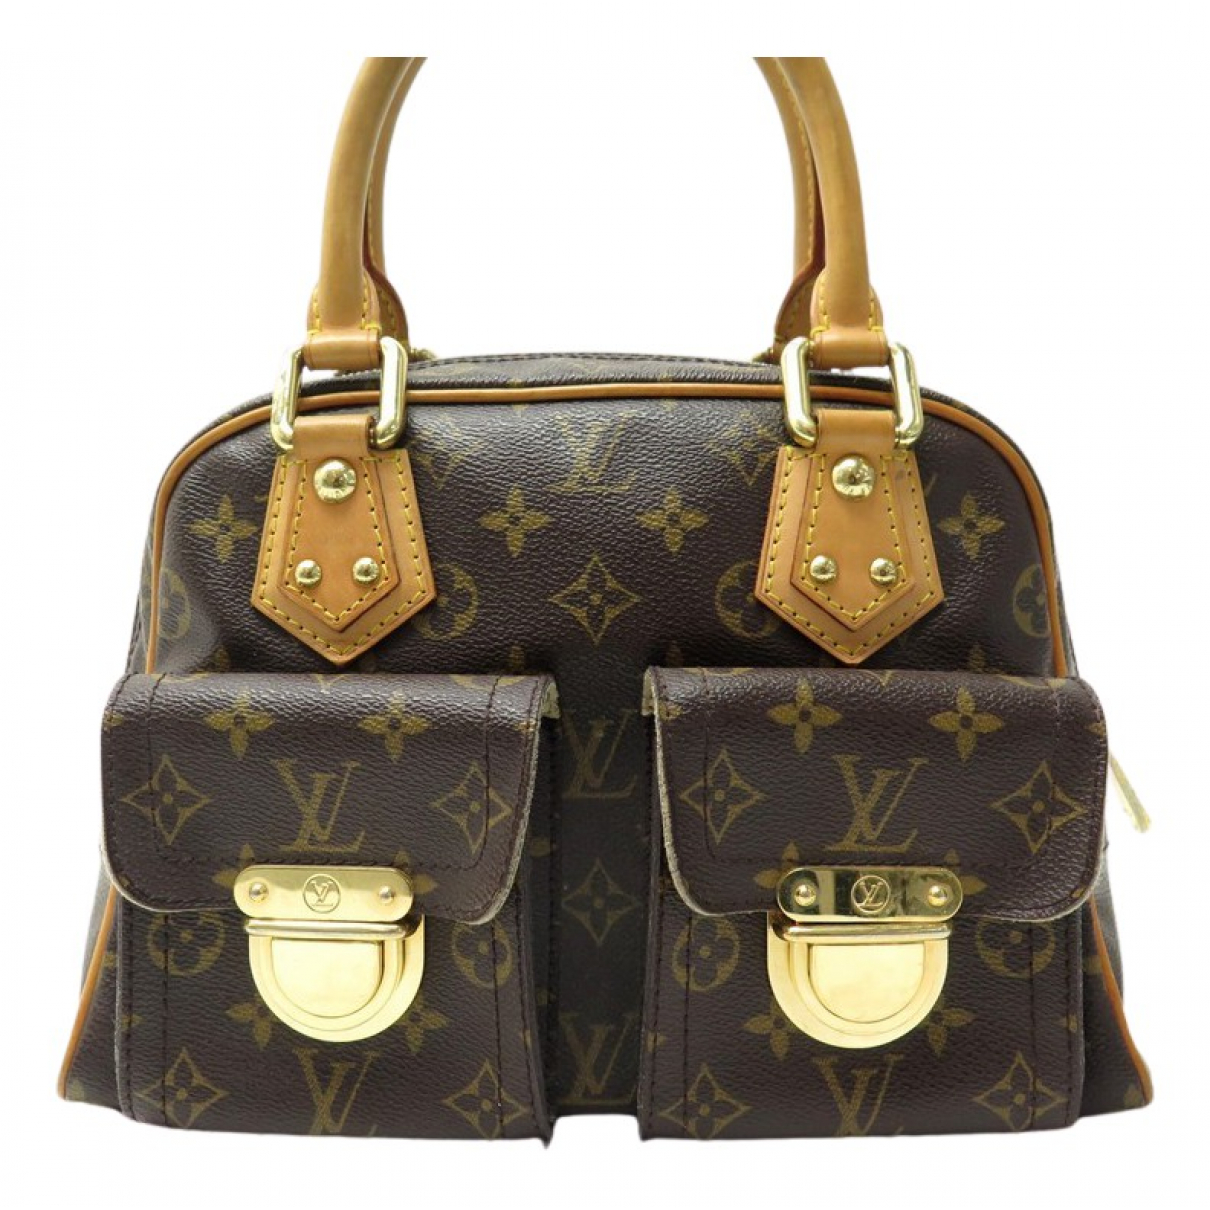 Louis Vuitton - Sac a main Manhattan pour femme en toile - marron